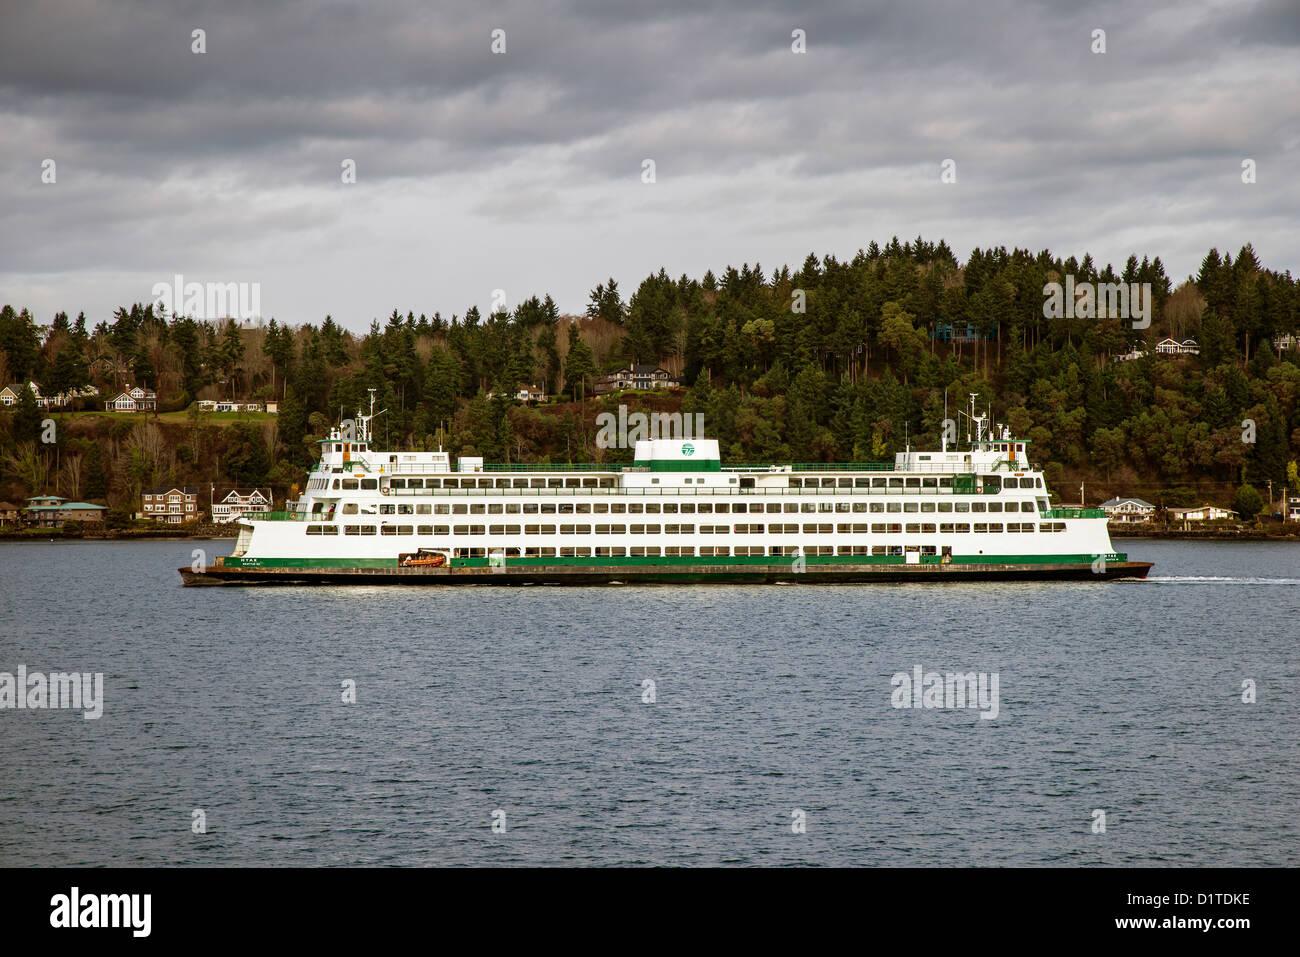 Washington State ferry crossing Puget Sound, Seattle, Washington, USA - Stock Image